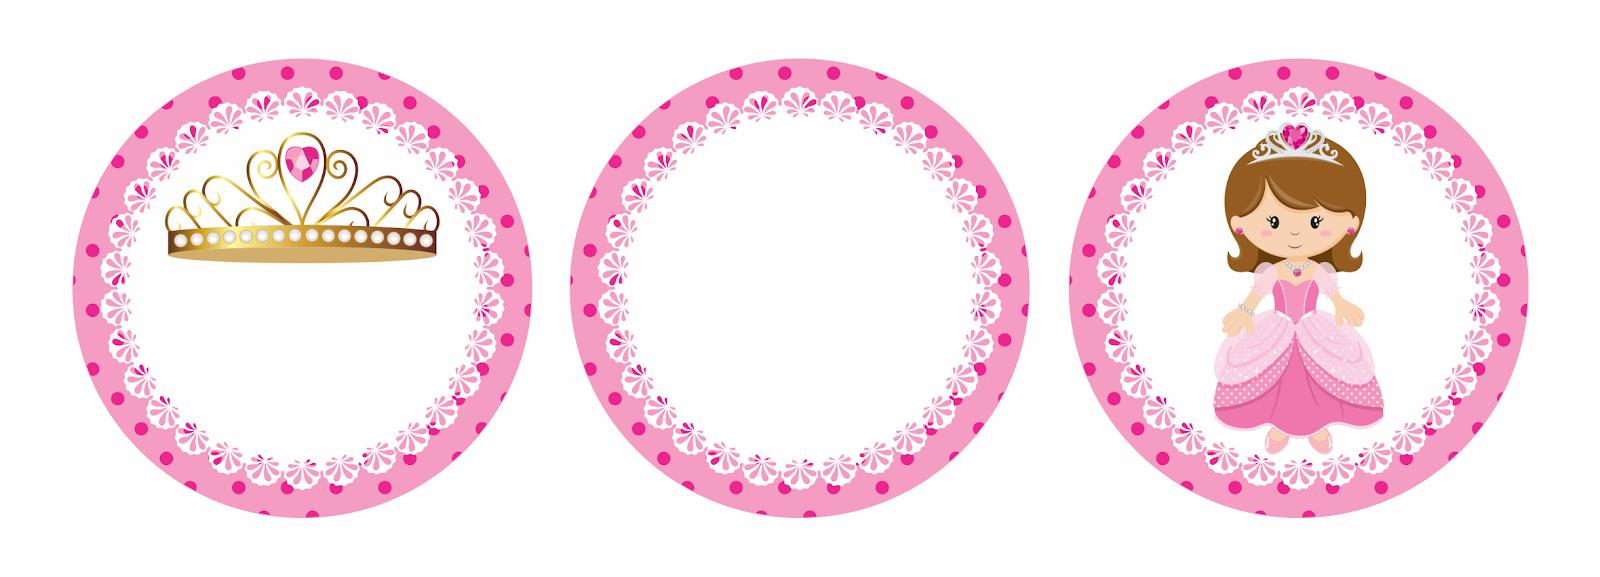 Princesa En Rosa Toppers Para Tartas Tortas Pasteles Bizcochos